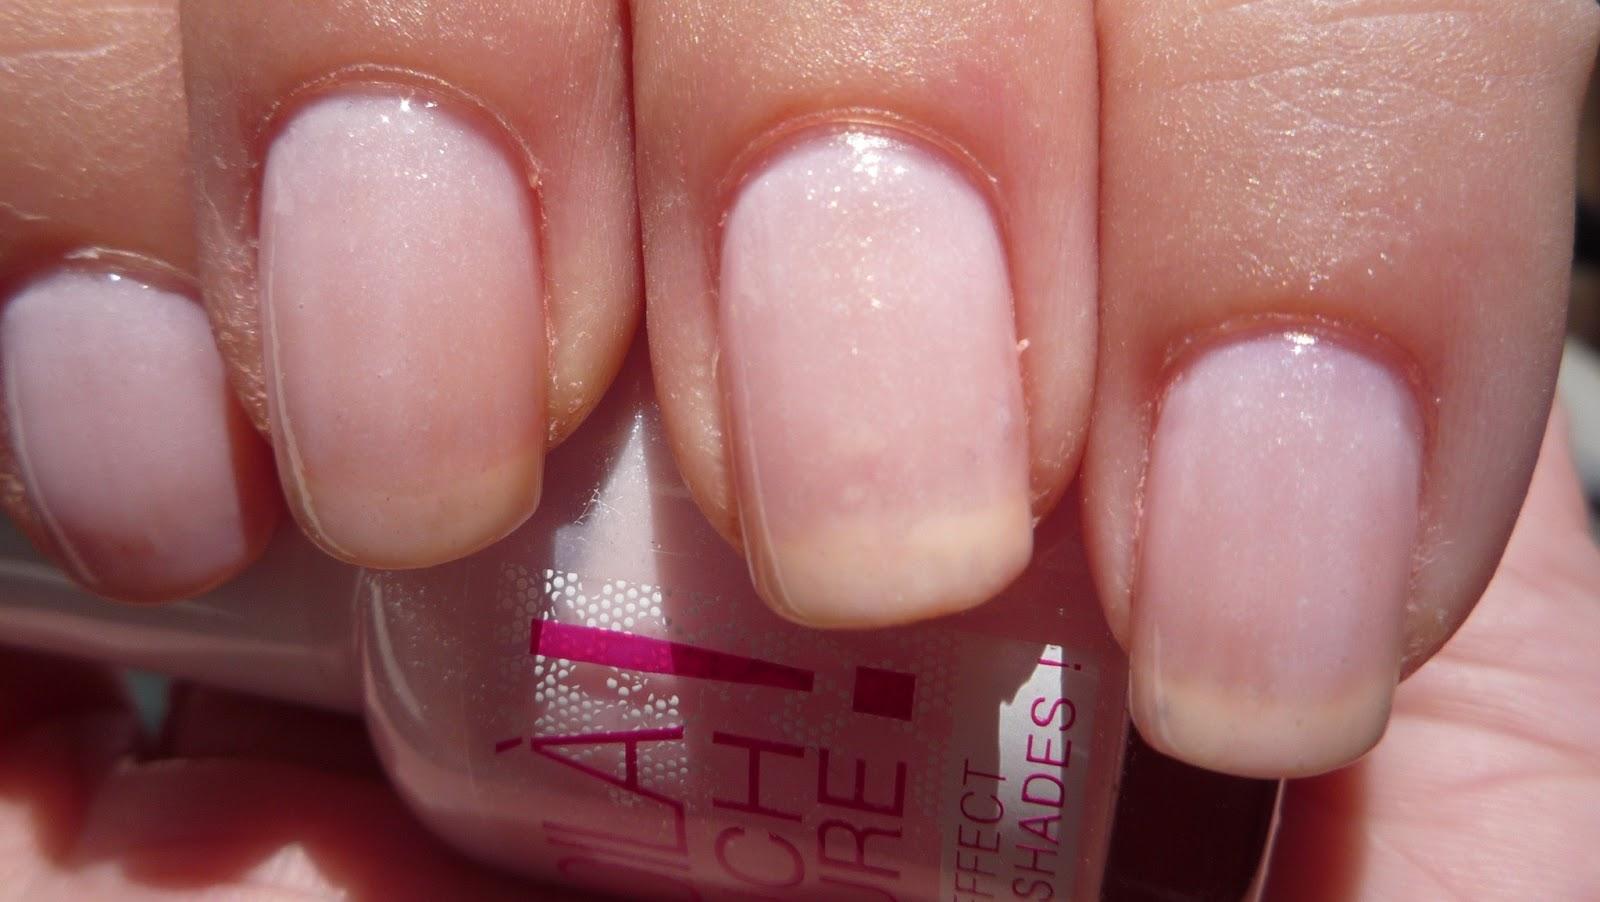 Miss Sporty Et Voila French Manicure 6 Tedinka Nails